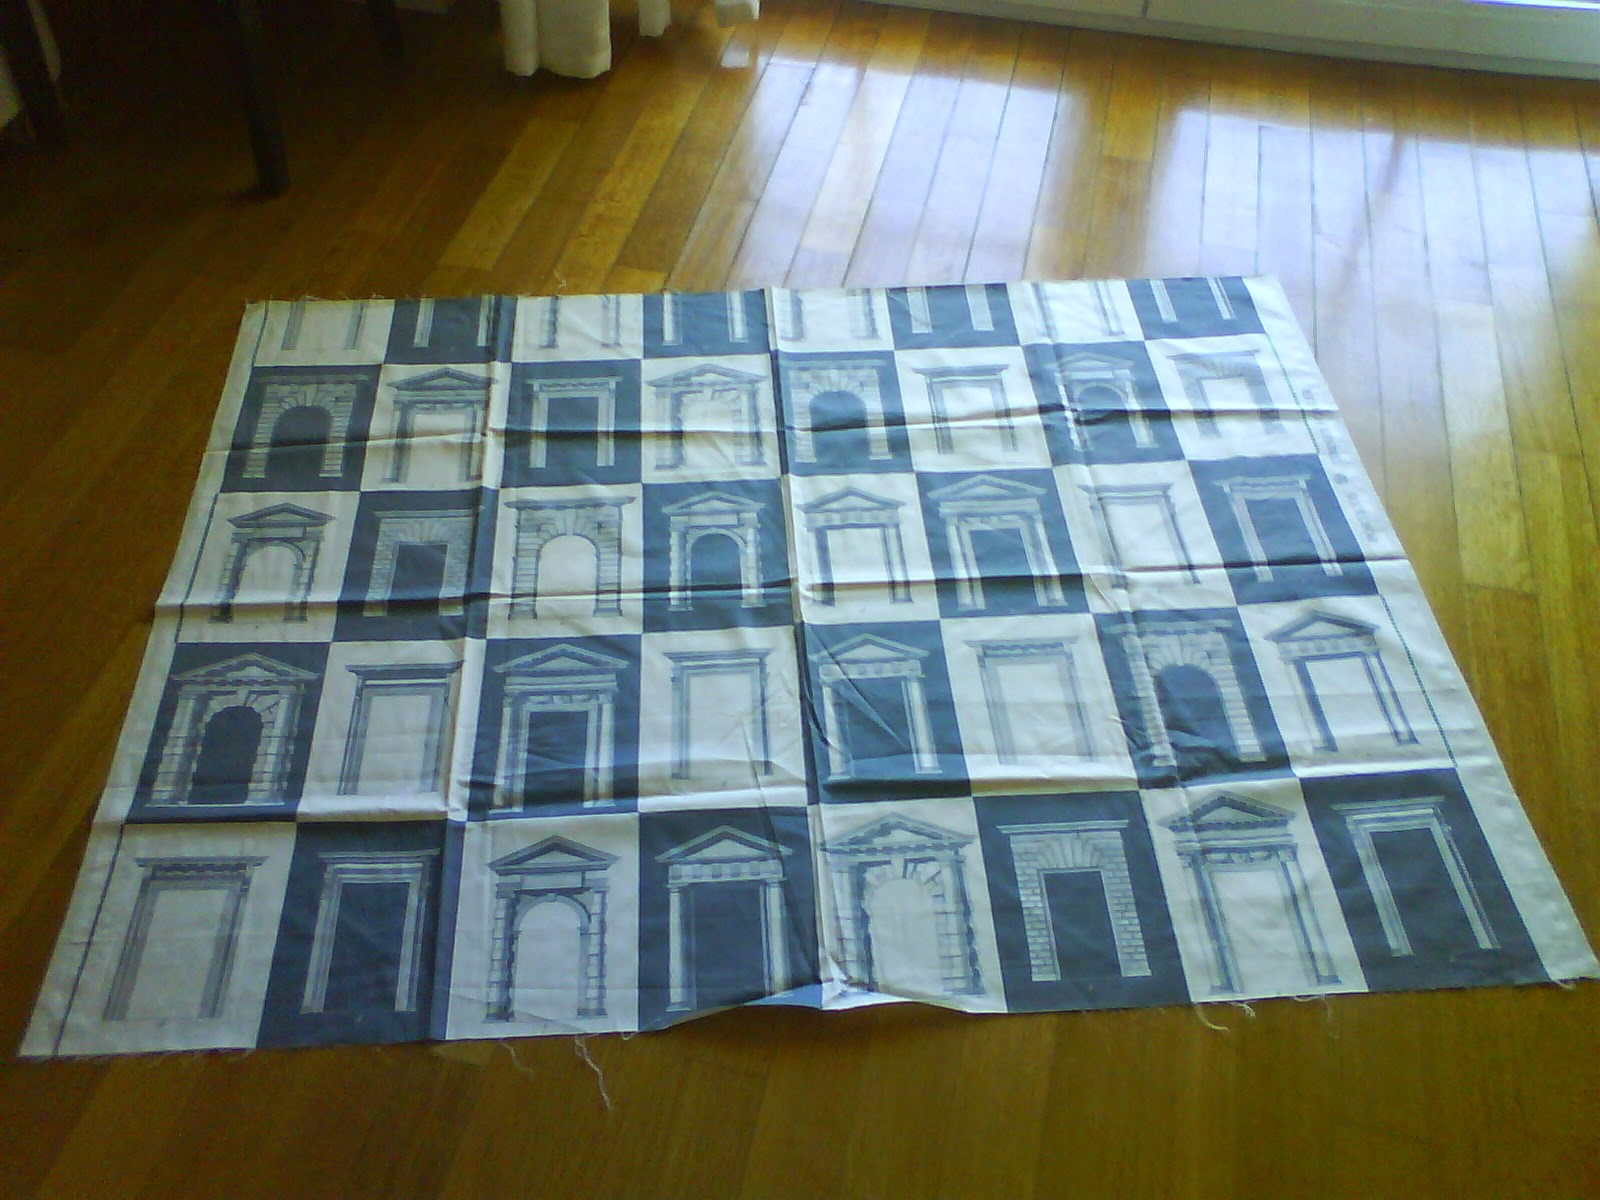 Tinmney Fowler fabric